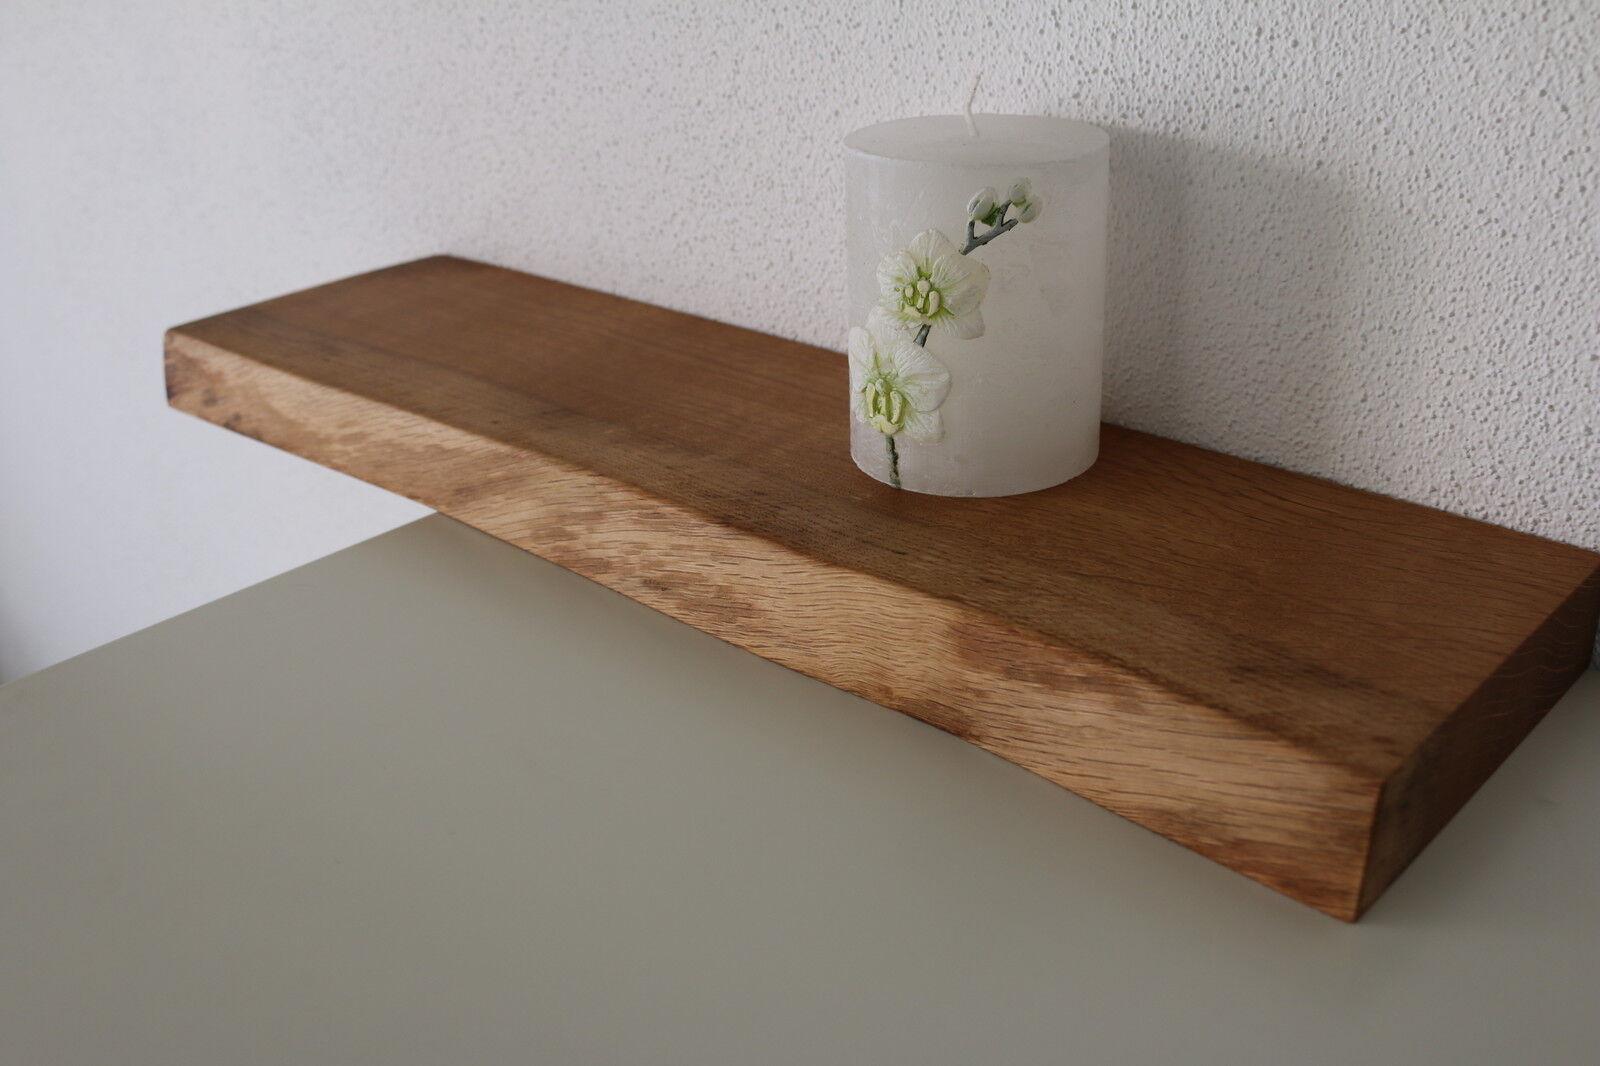 wandboard eiche wild massiv holz board regal steckboard regalbrett baumkante eur 67 00. Black Bedroom Furniture Sets. Home Design Ideas